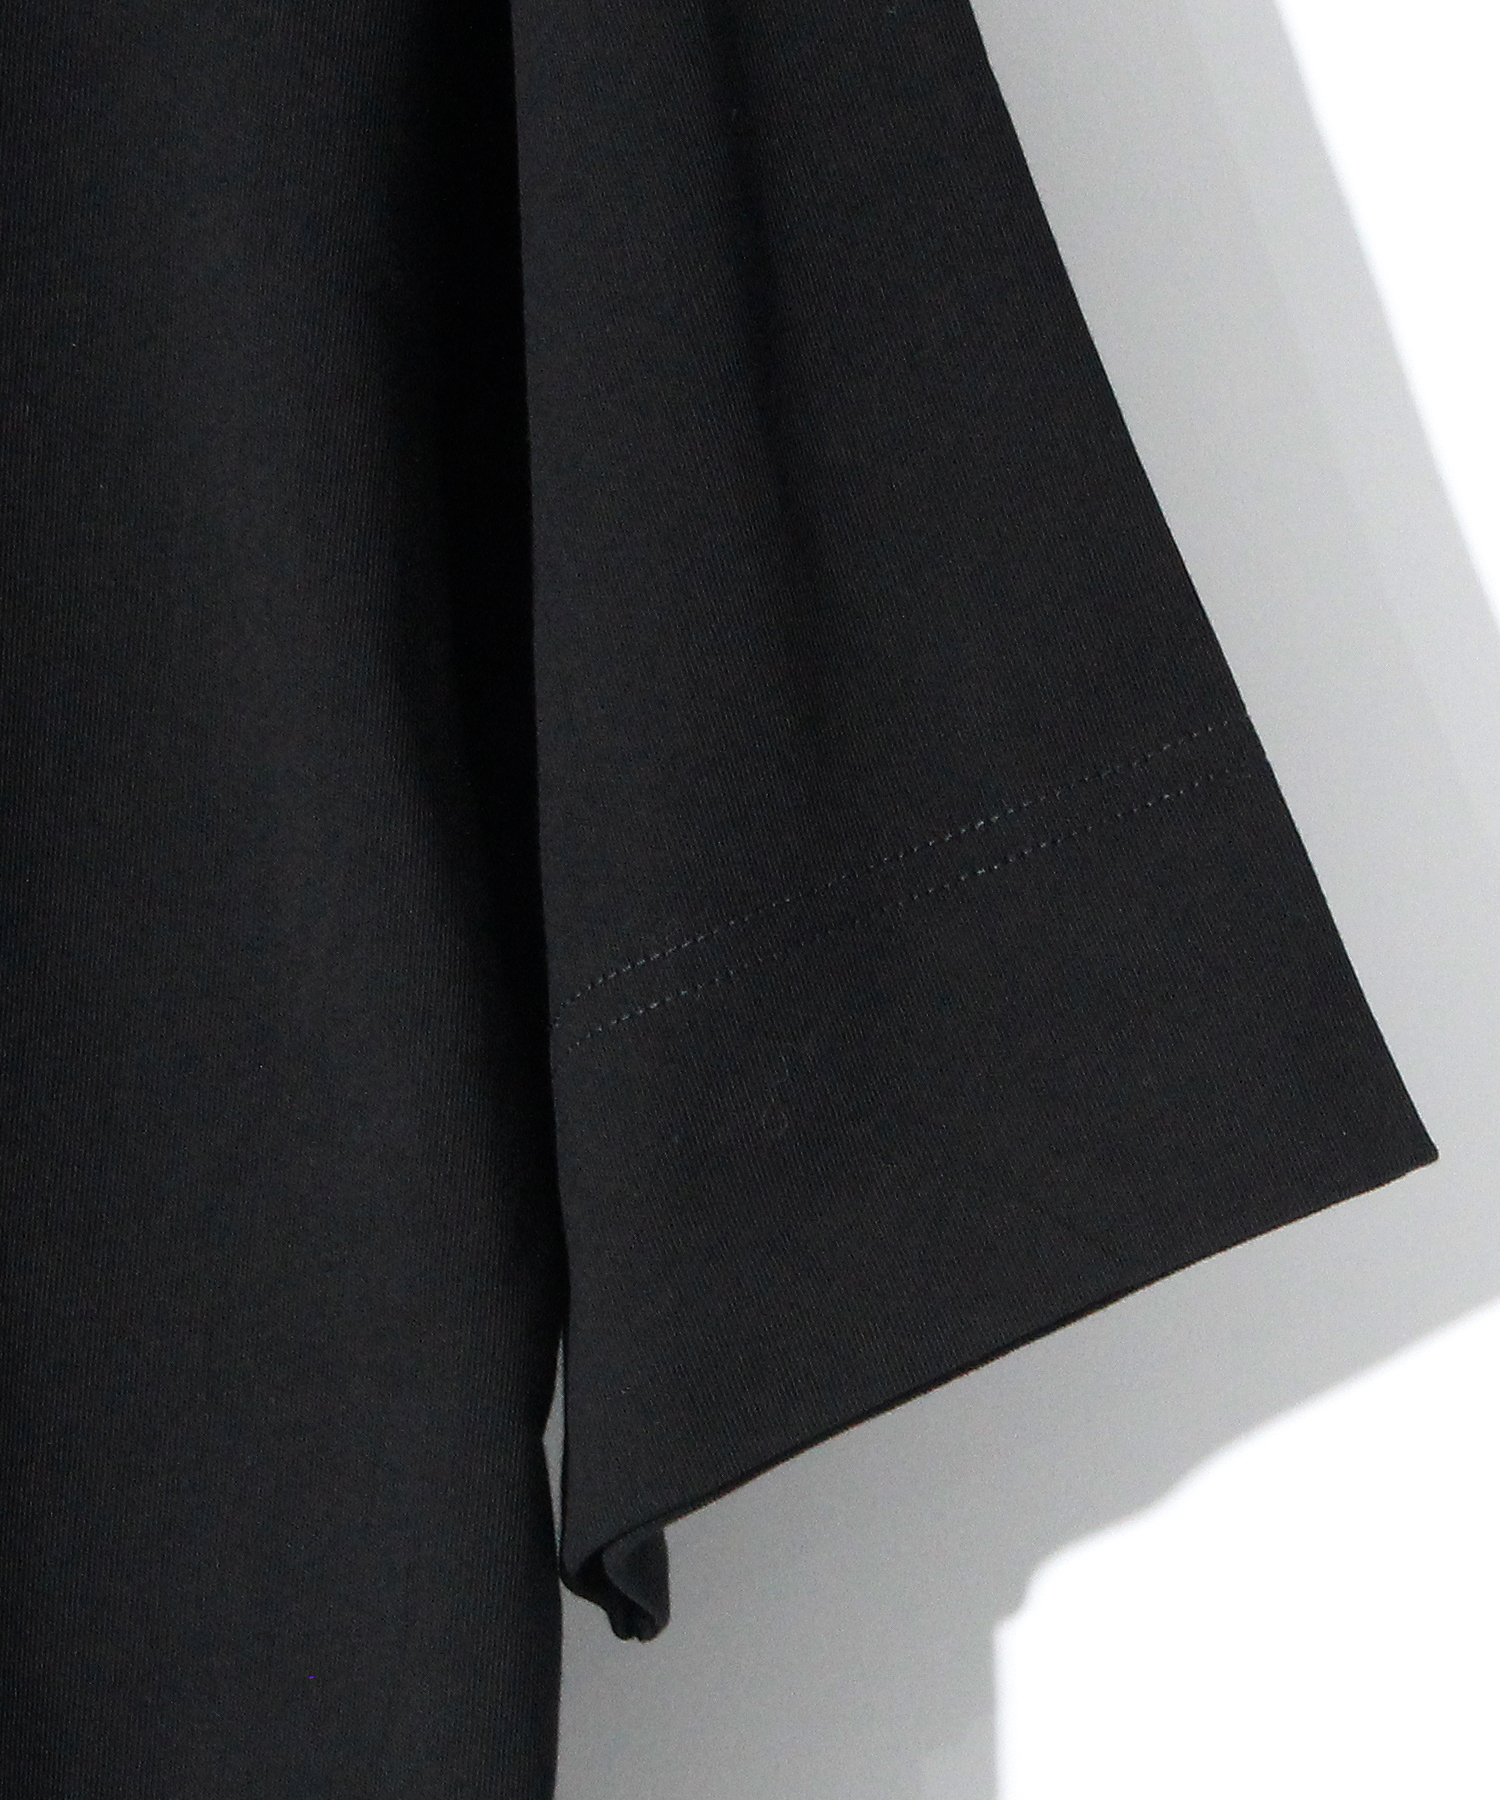 H.K.M.H LAYERED TEE [BLACK]